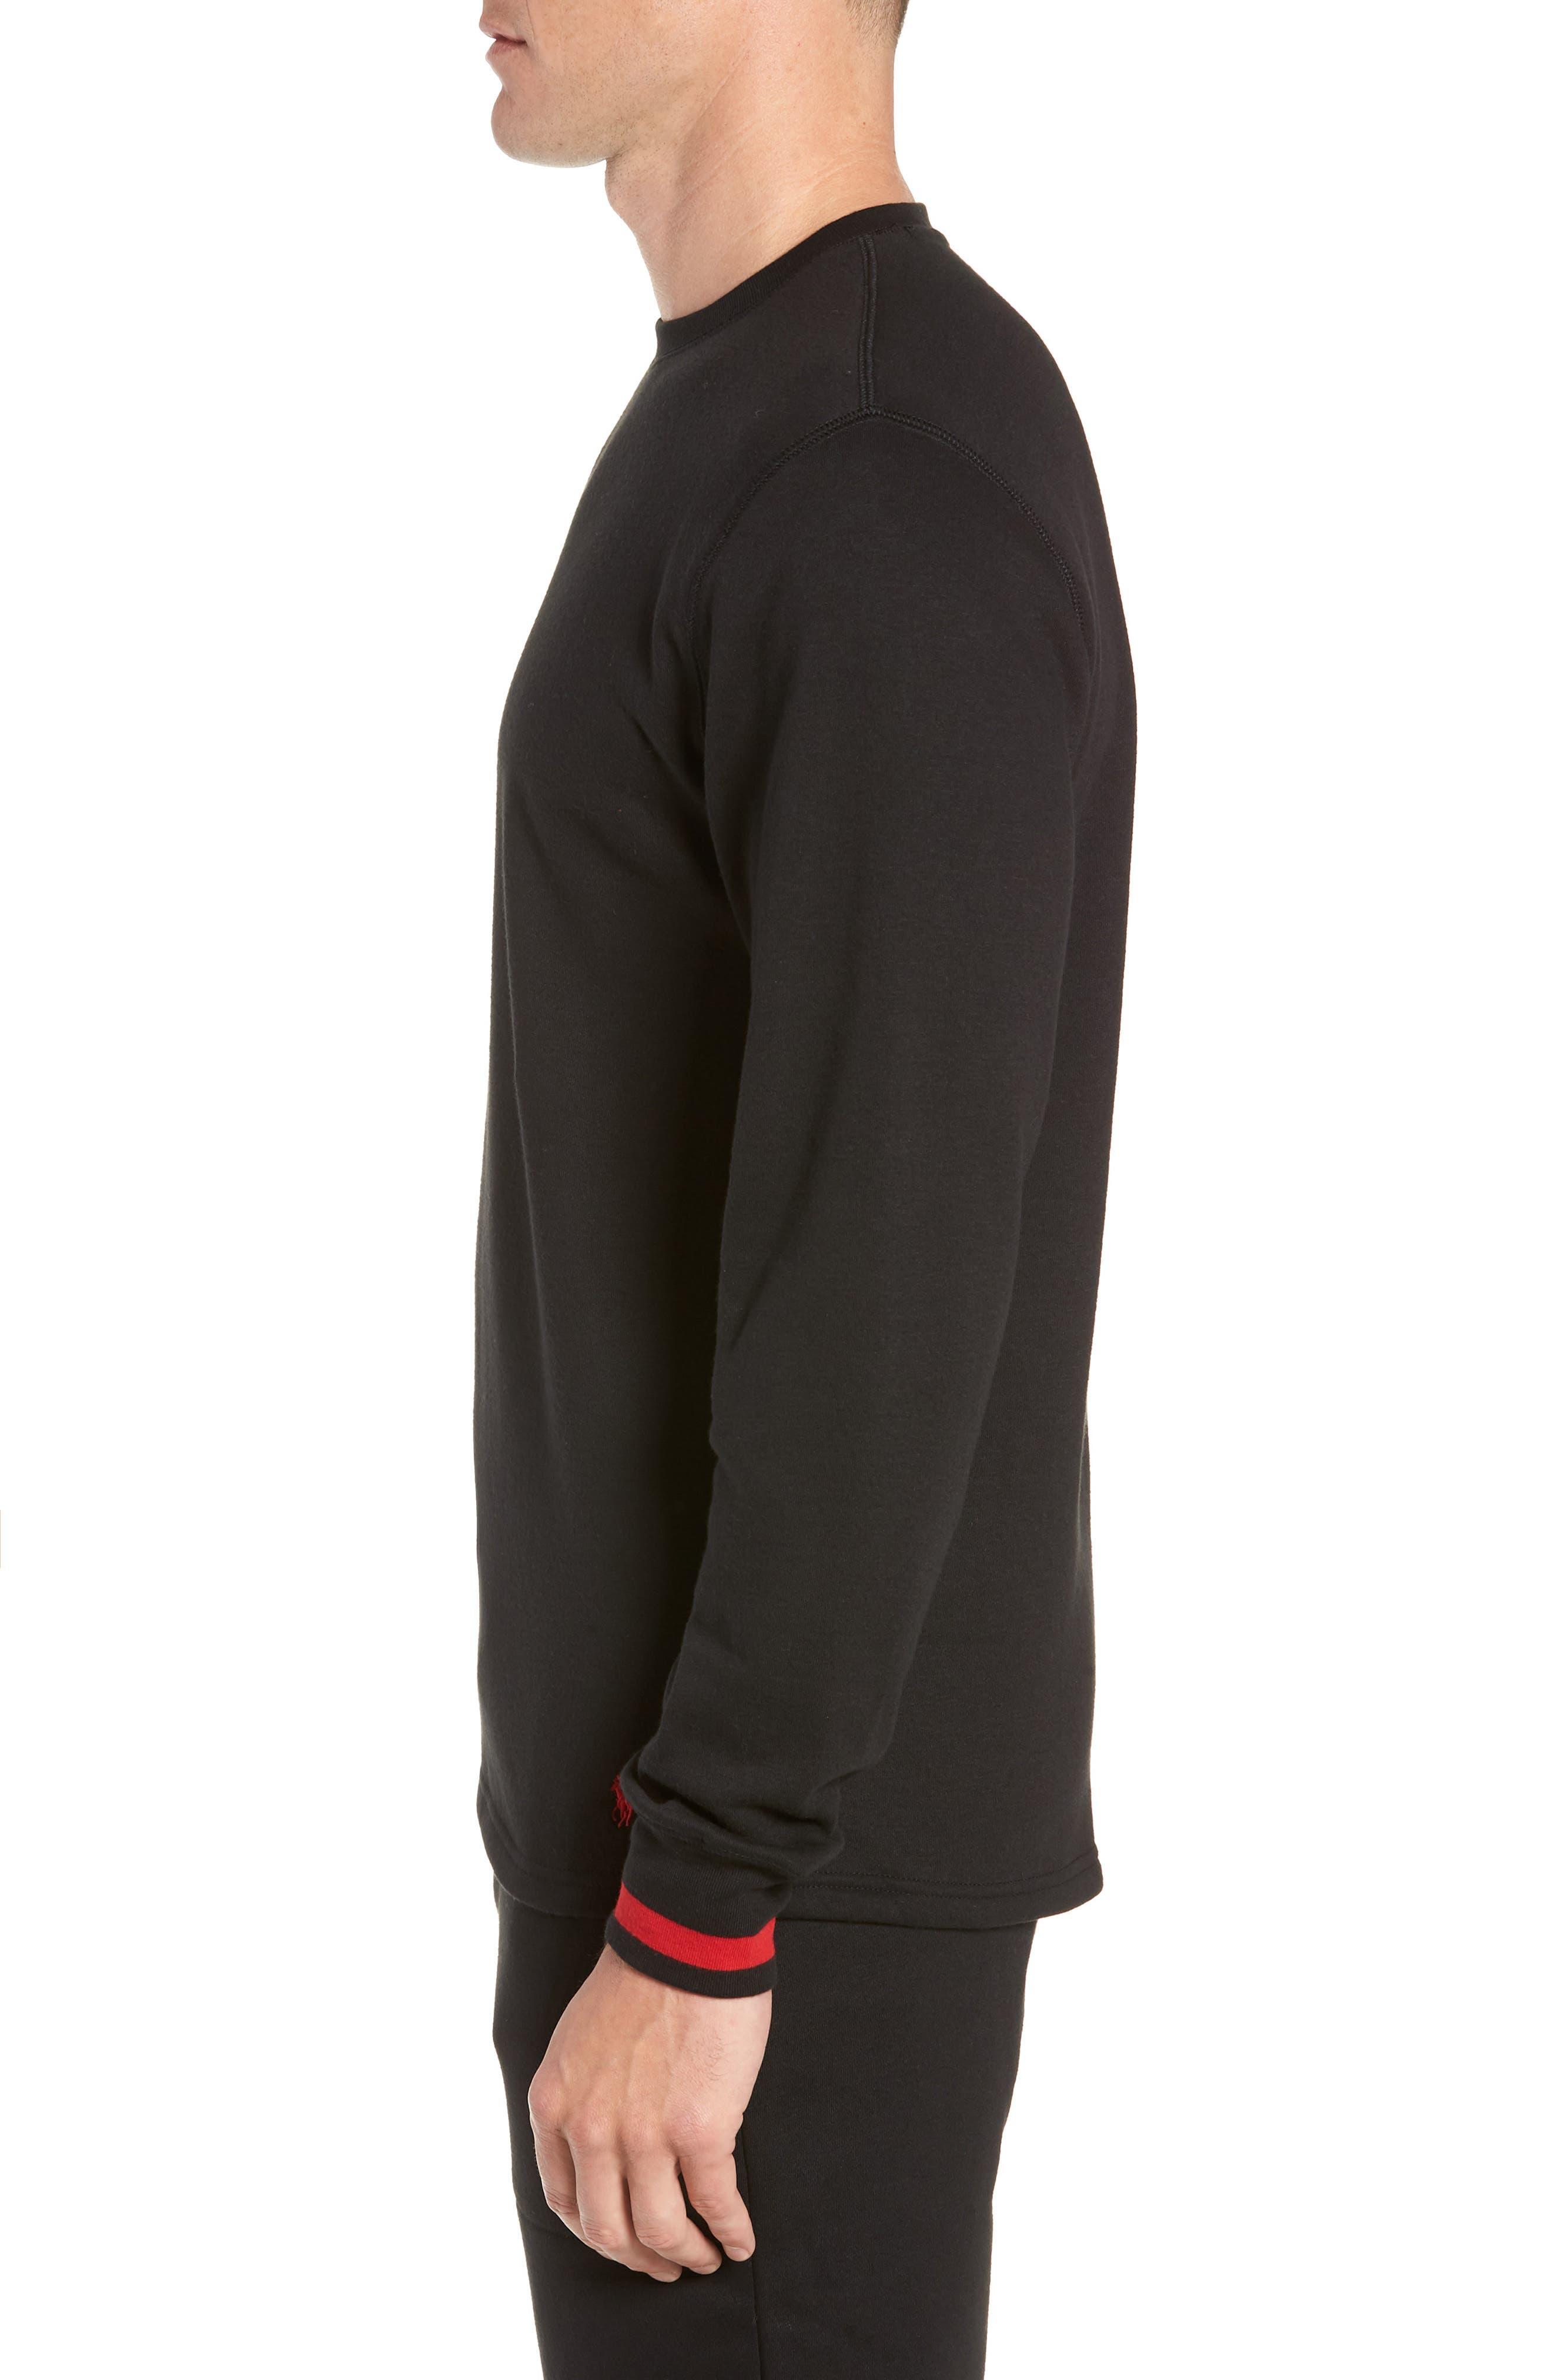 POLO RALPH LAUREN,                             Brushed Jersey Cotton Blend Crewneck Sweatshirt,                             Alternate thumbnail 3, color,                             POLO BLACK